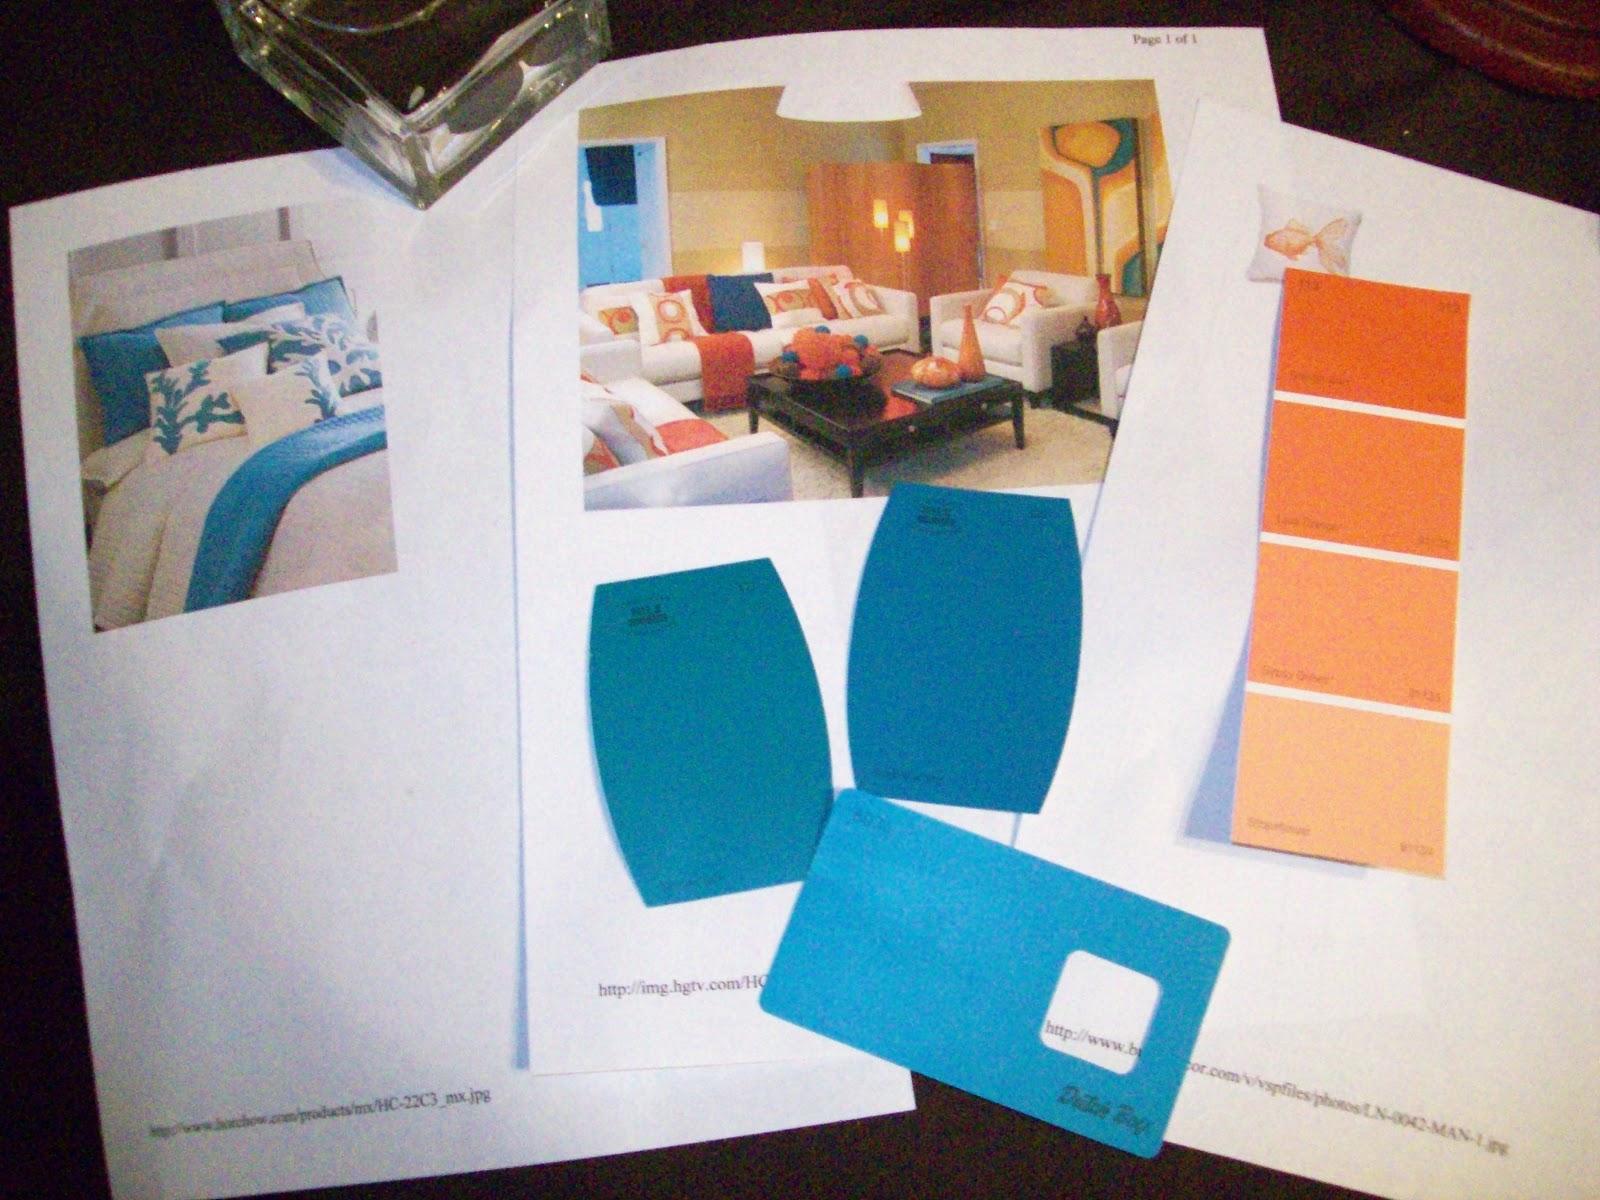 Danielle S Decor Modern Beach Themed Bedroom With A Color